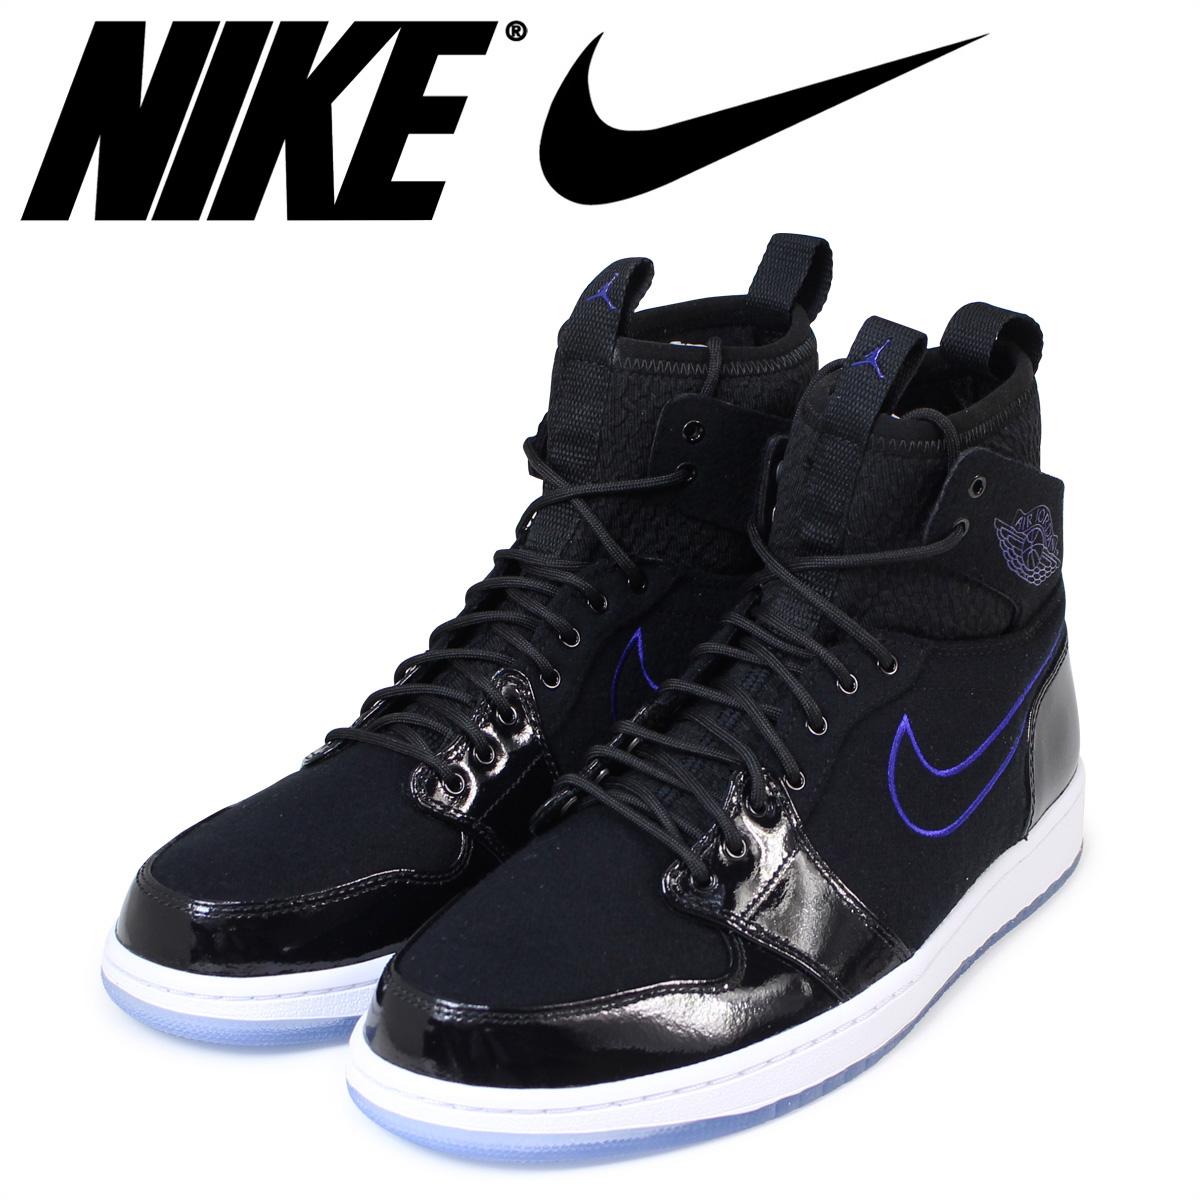 detailed look 6b04e fb7f7 ナイキNIKEエアジョーダンメンズスニーカーAIRJORDAN1HIGHULTRABRED844700-001靴ブラック ...